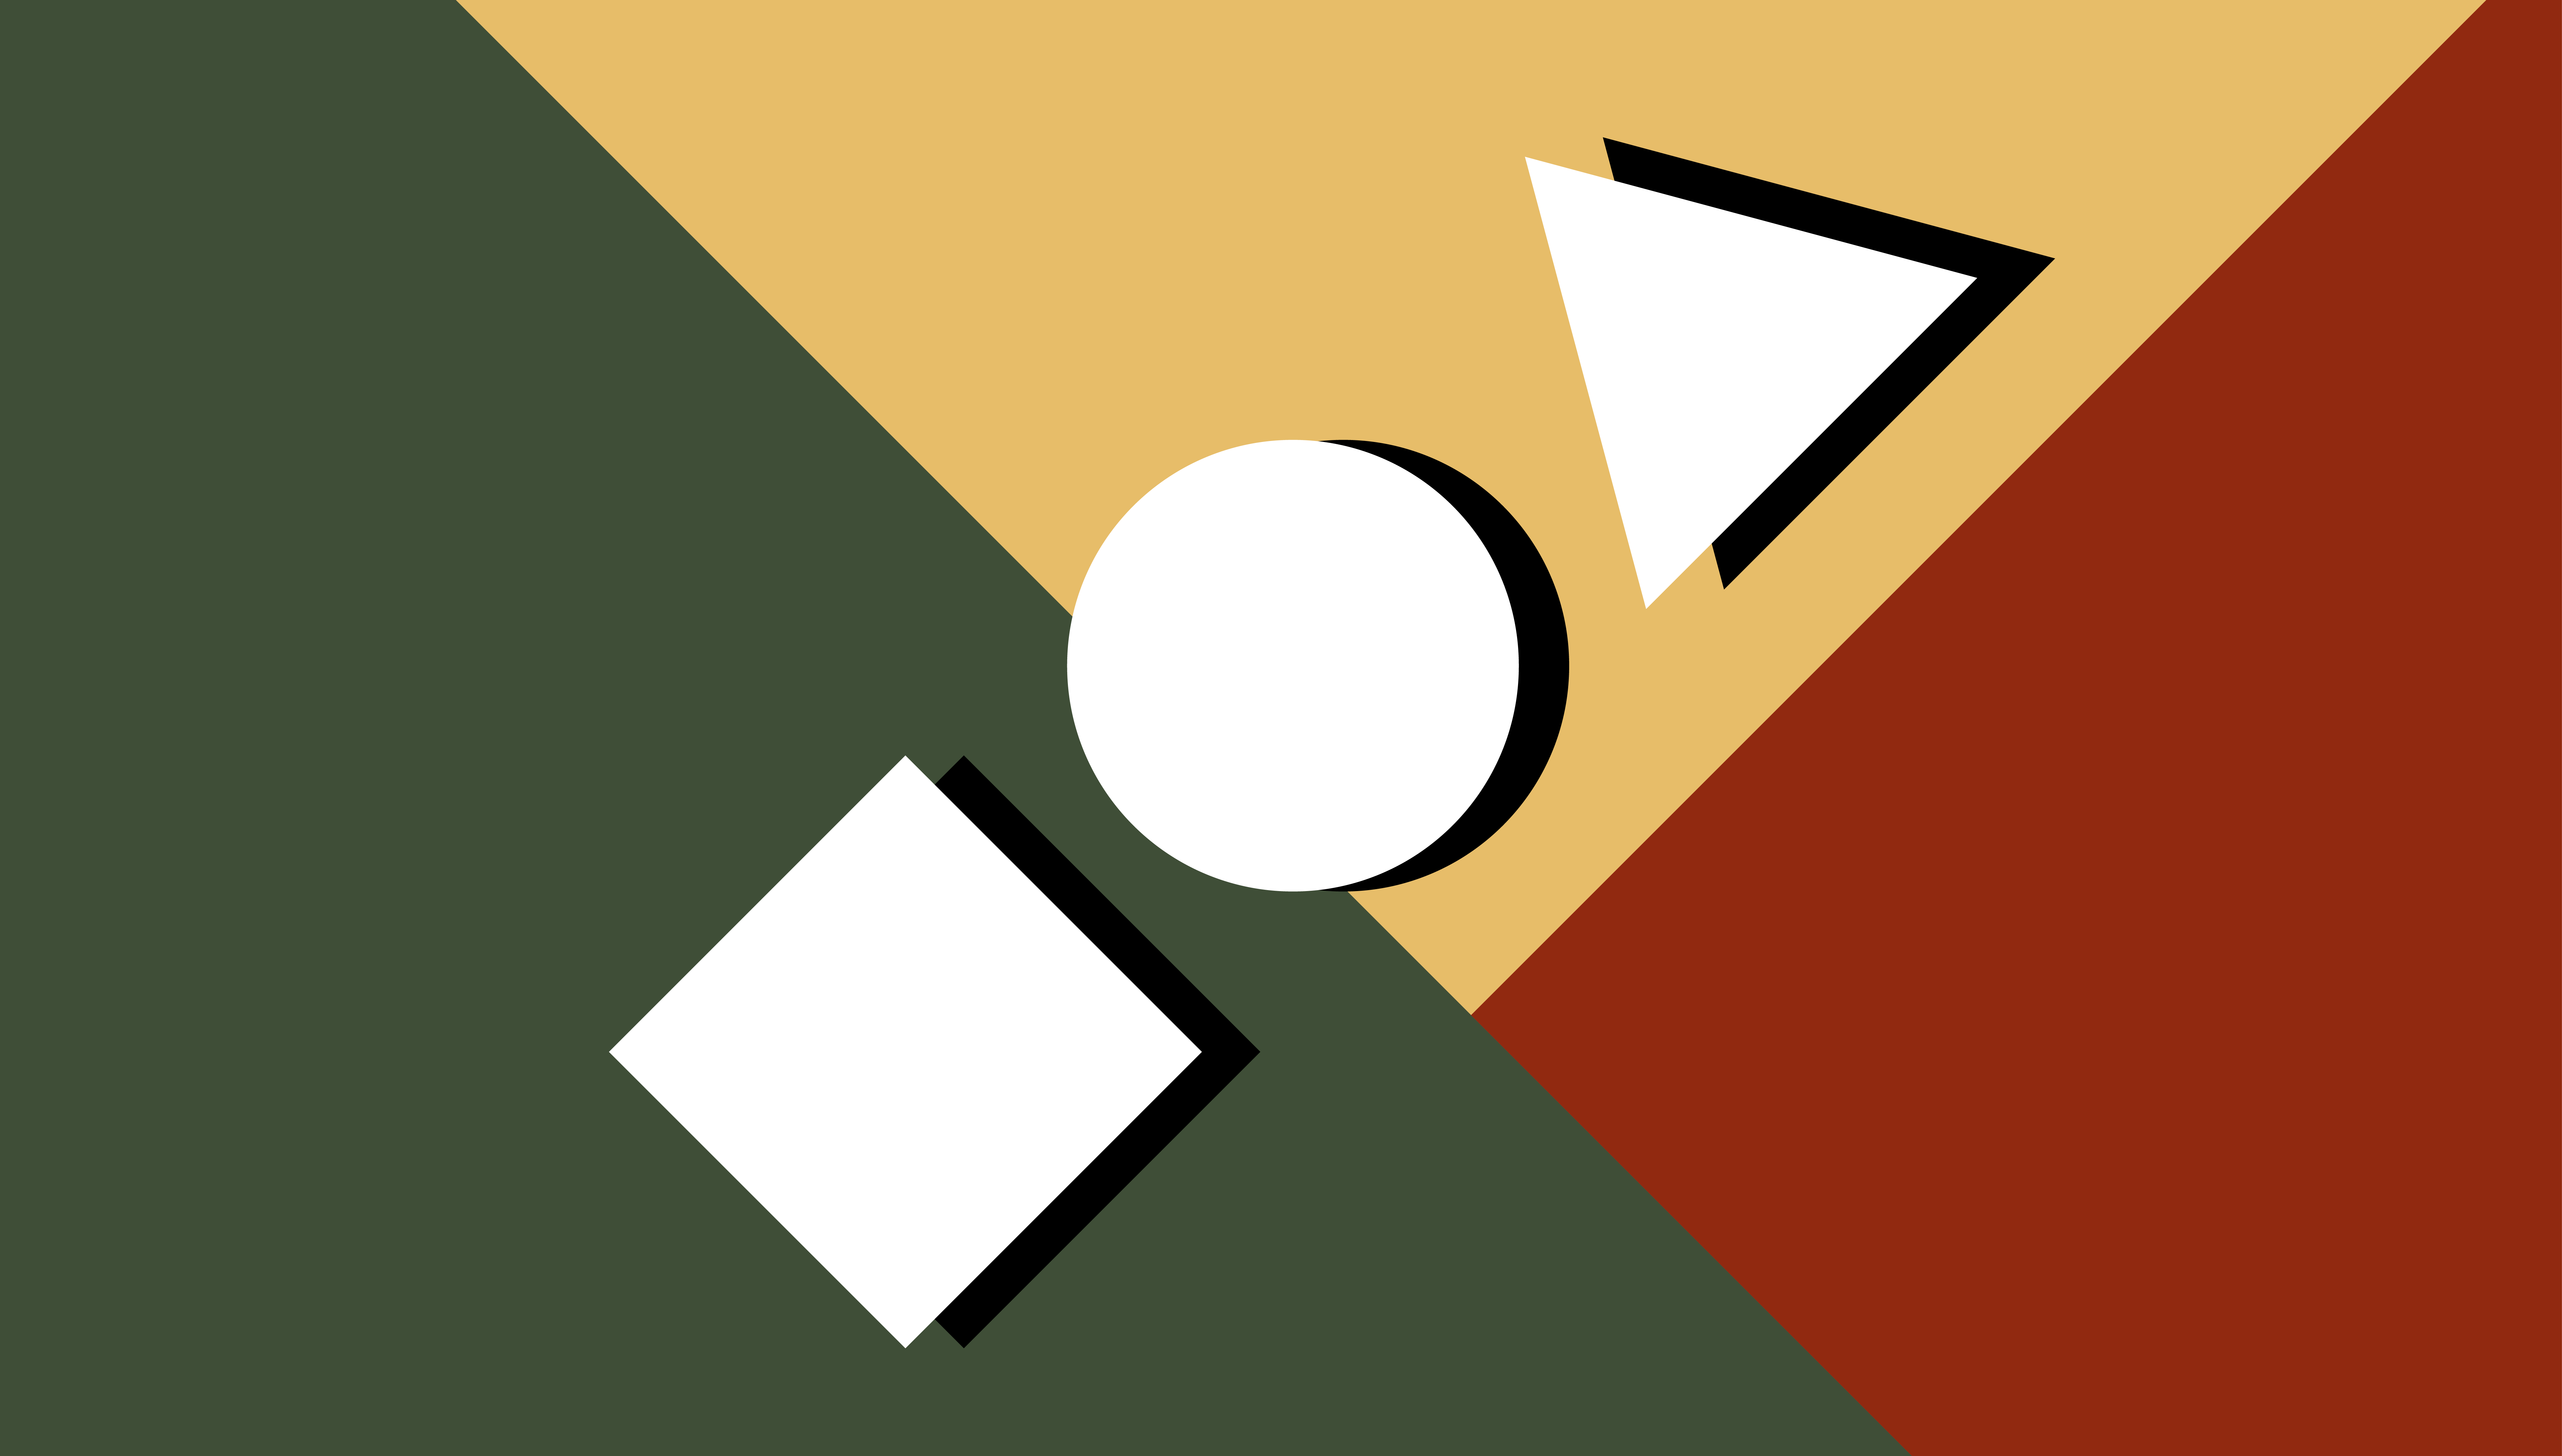 Bauhaus by solgf on DeviantArt